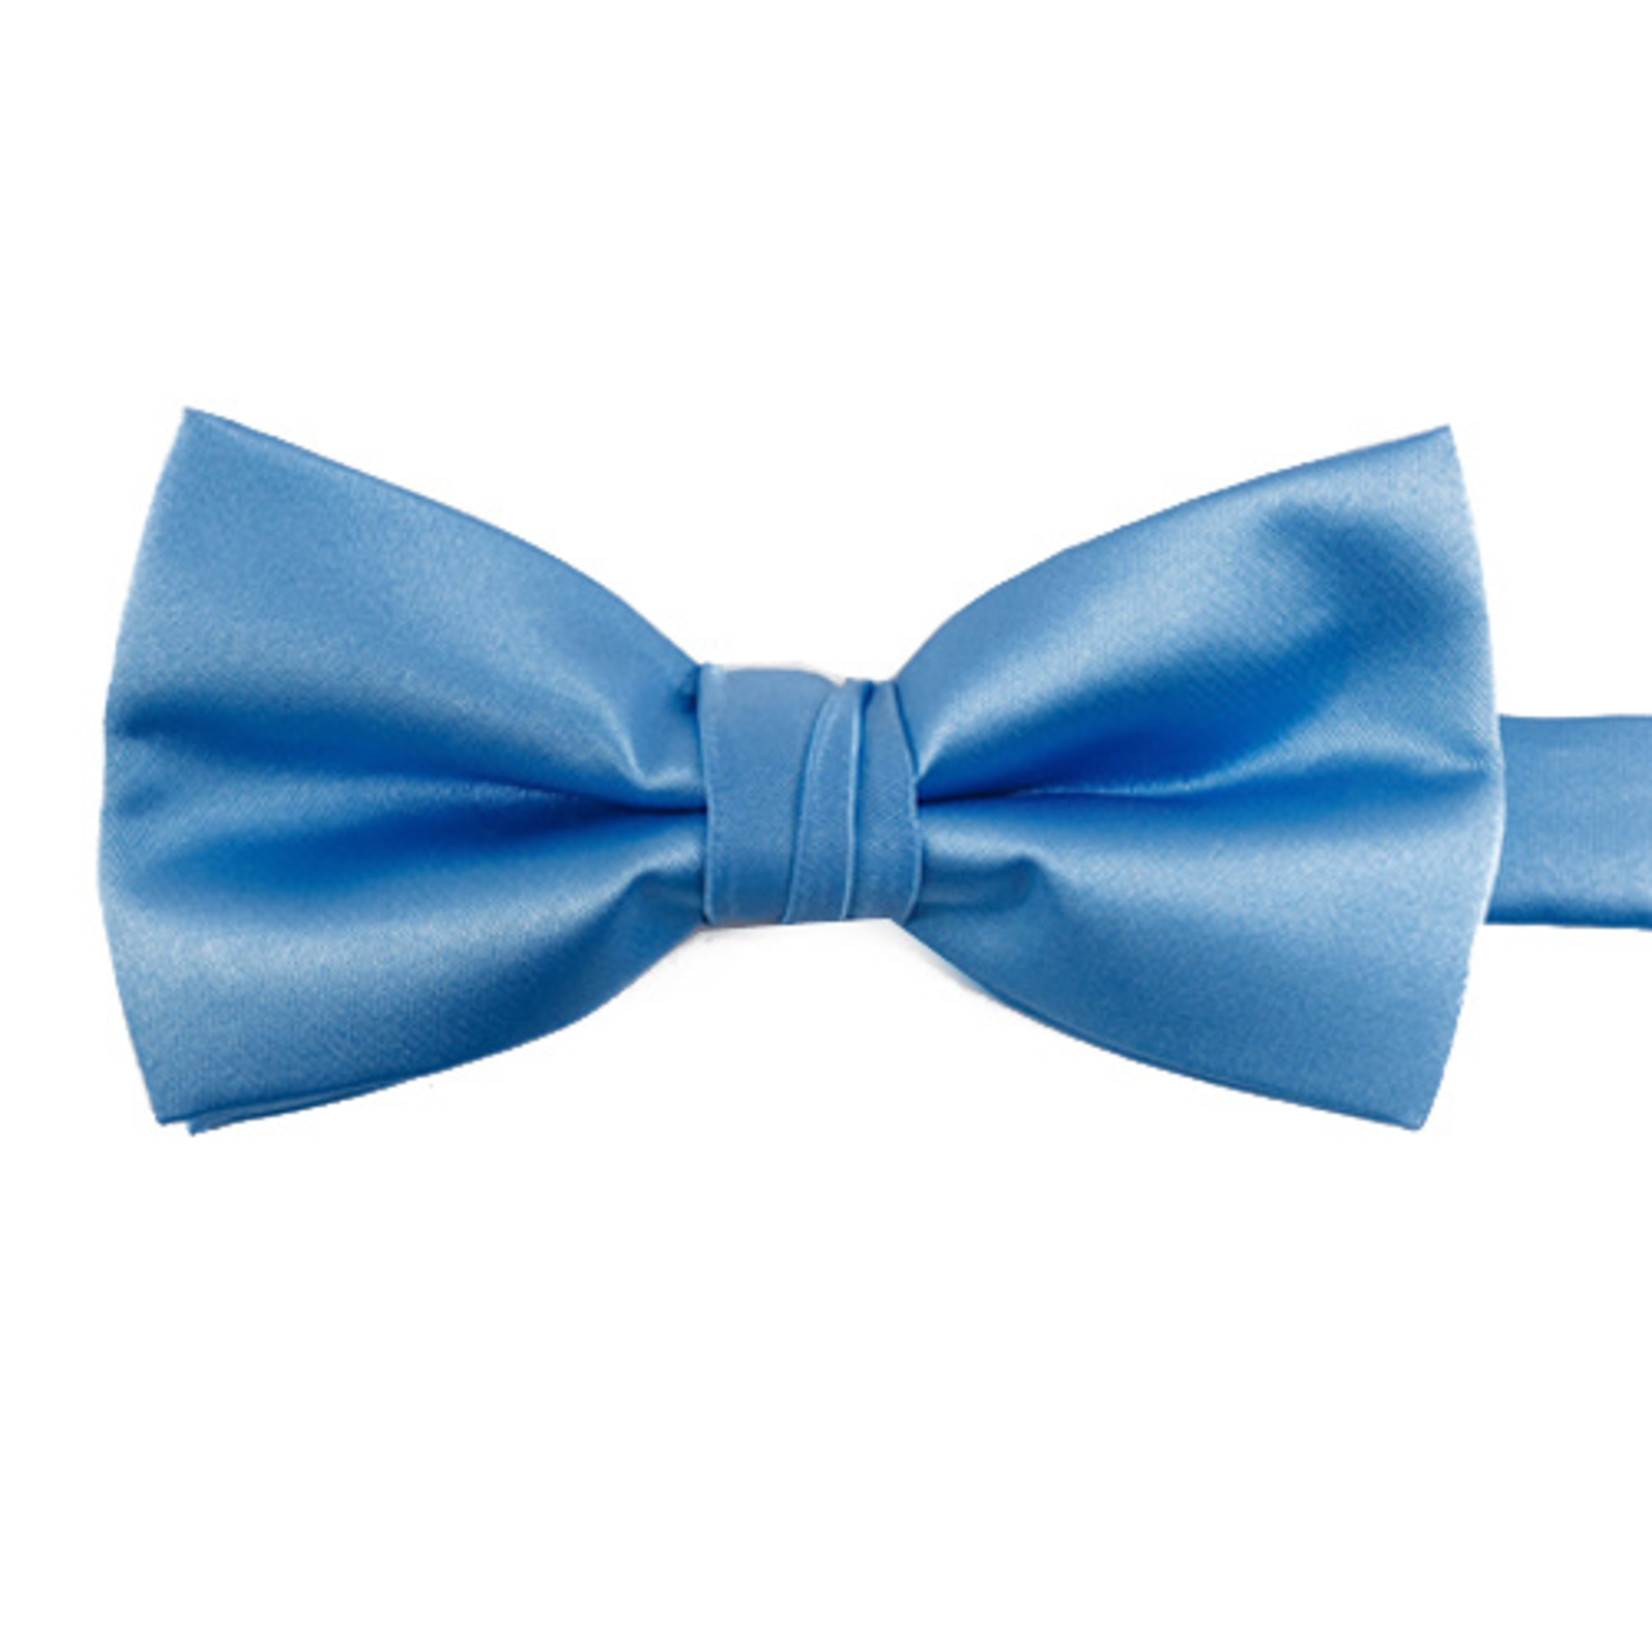 Knotz M100BT-12 Solid Blue Bowtie